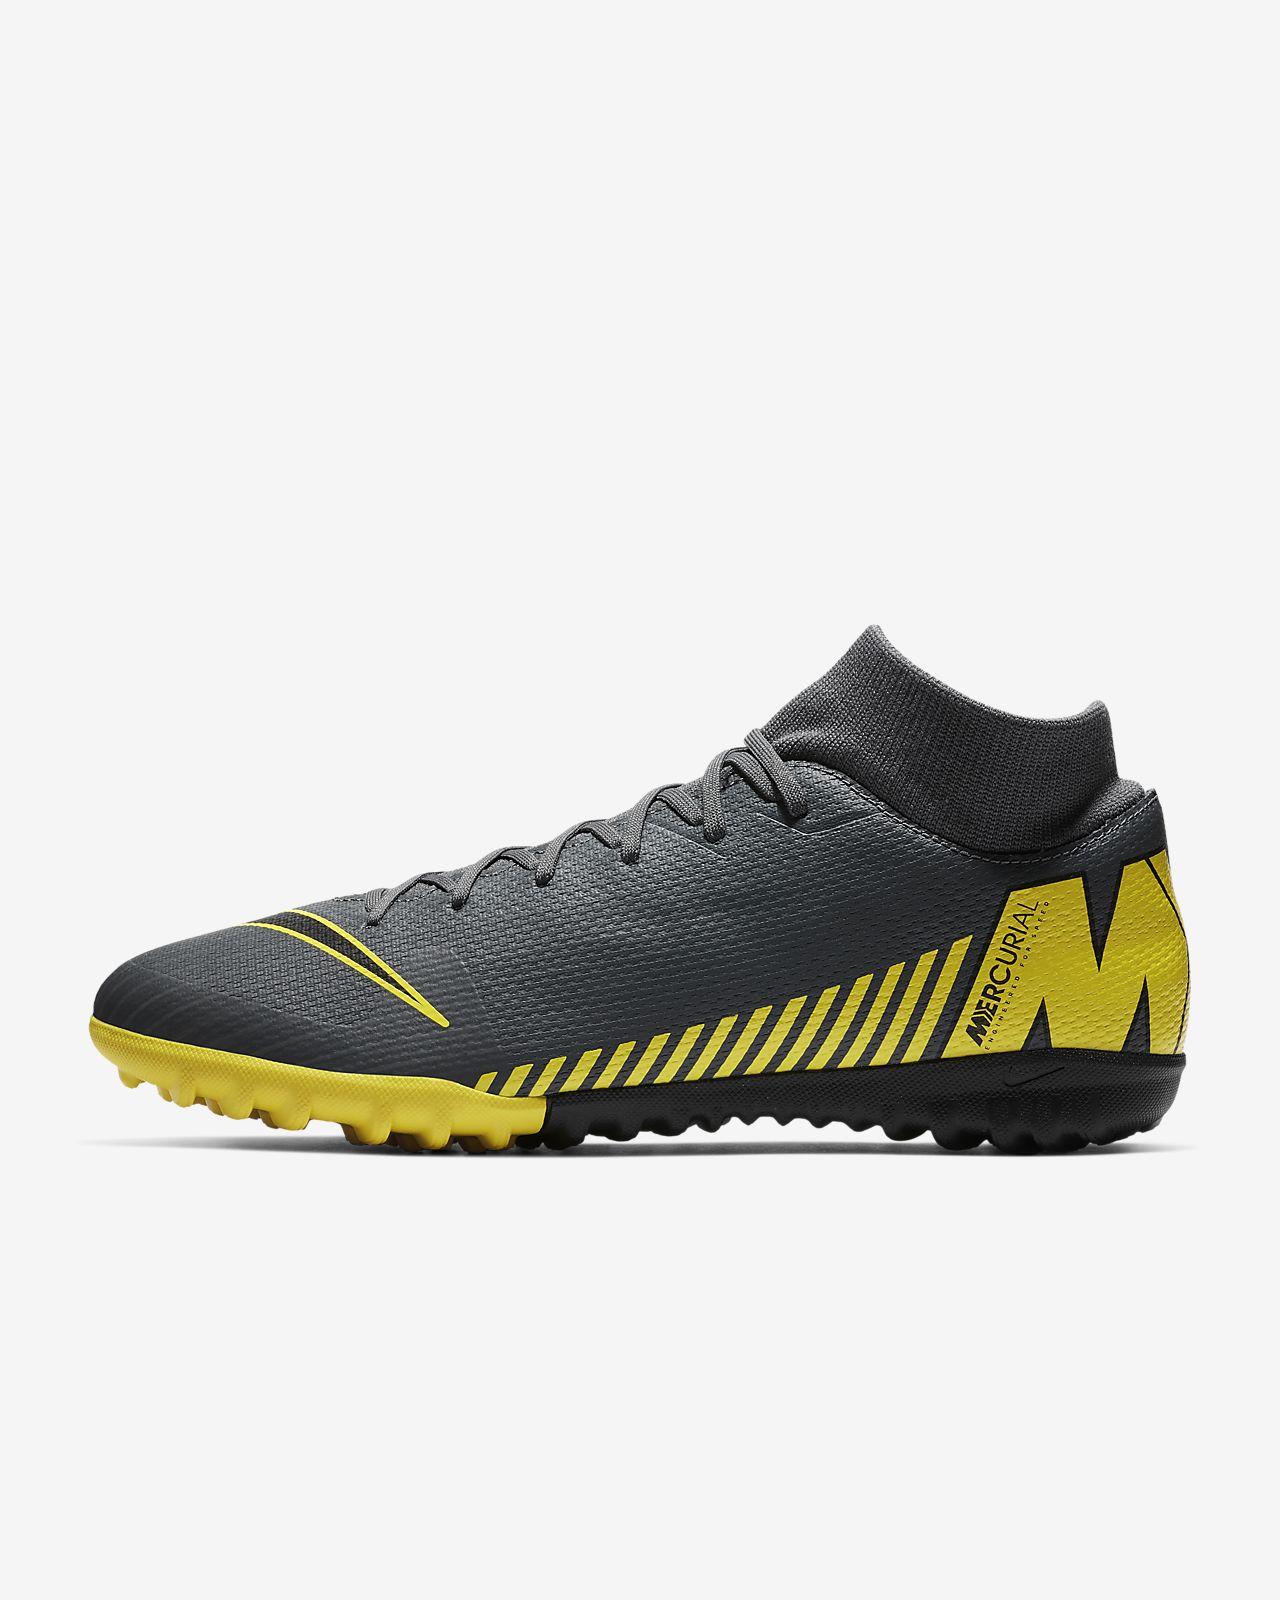 Fotbollssko för grus/turf Nike SuperflyX 6 Academy TF